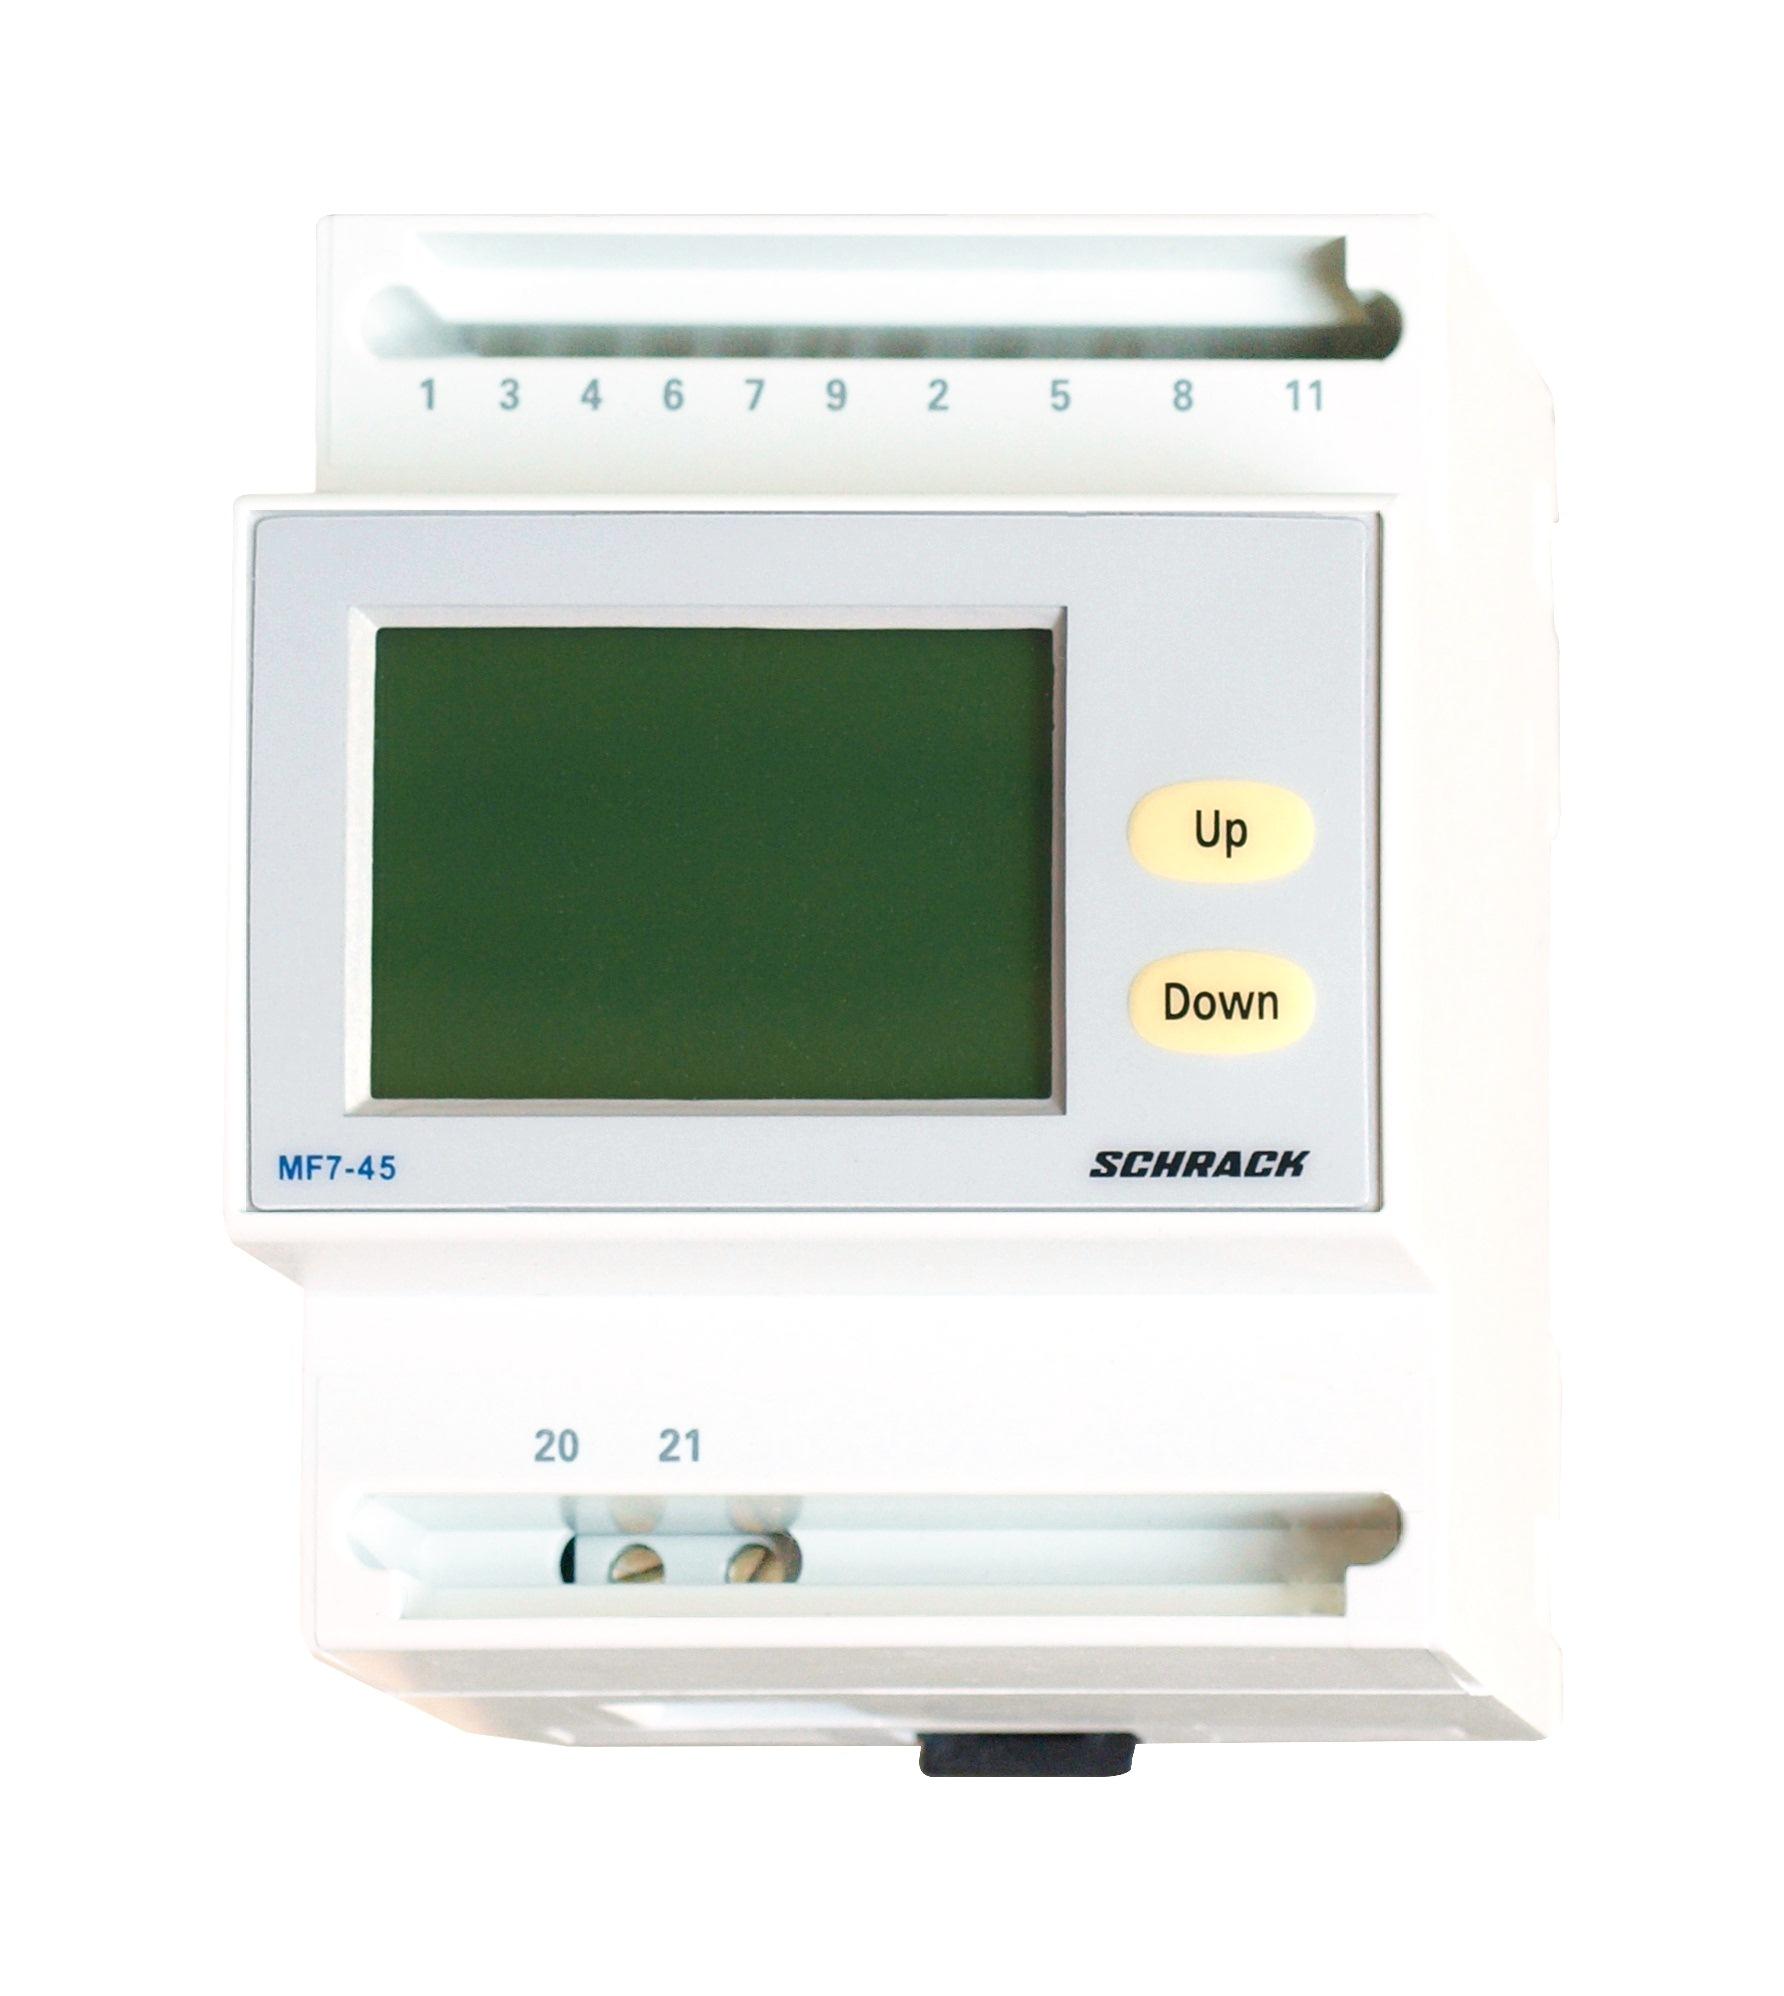 1 Stk Reiheneinbau Netzanalysator MF7-45, wandleranschluß MGR30000--